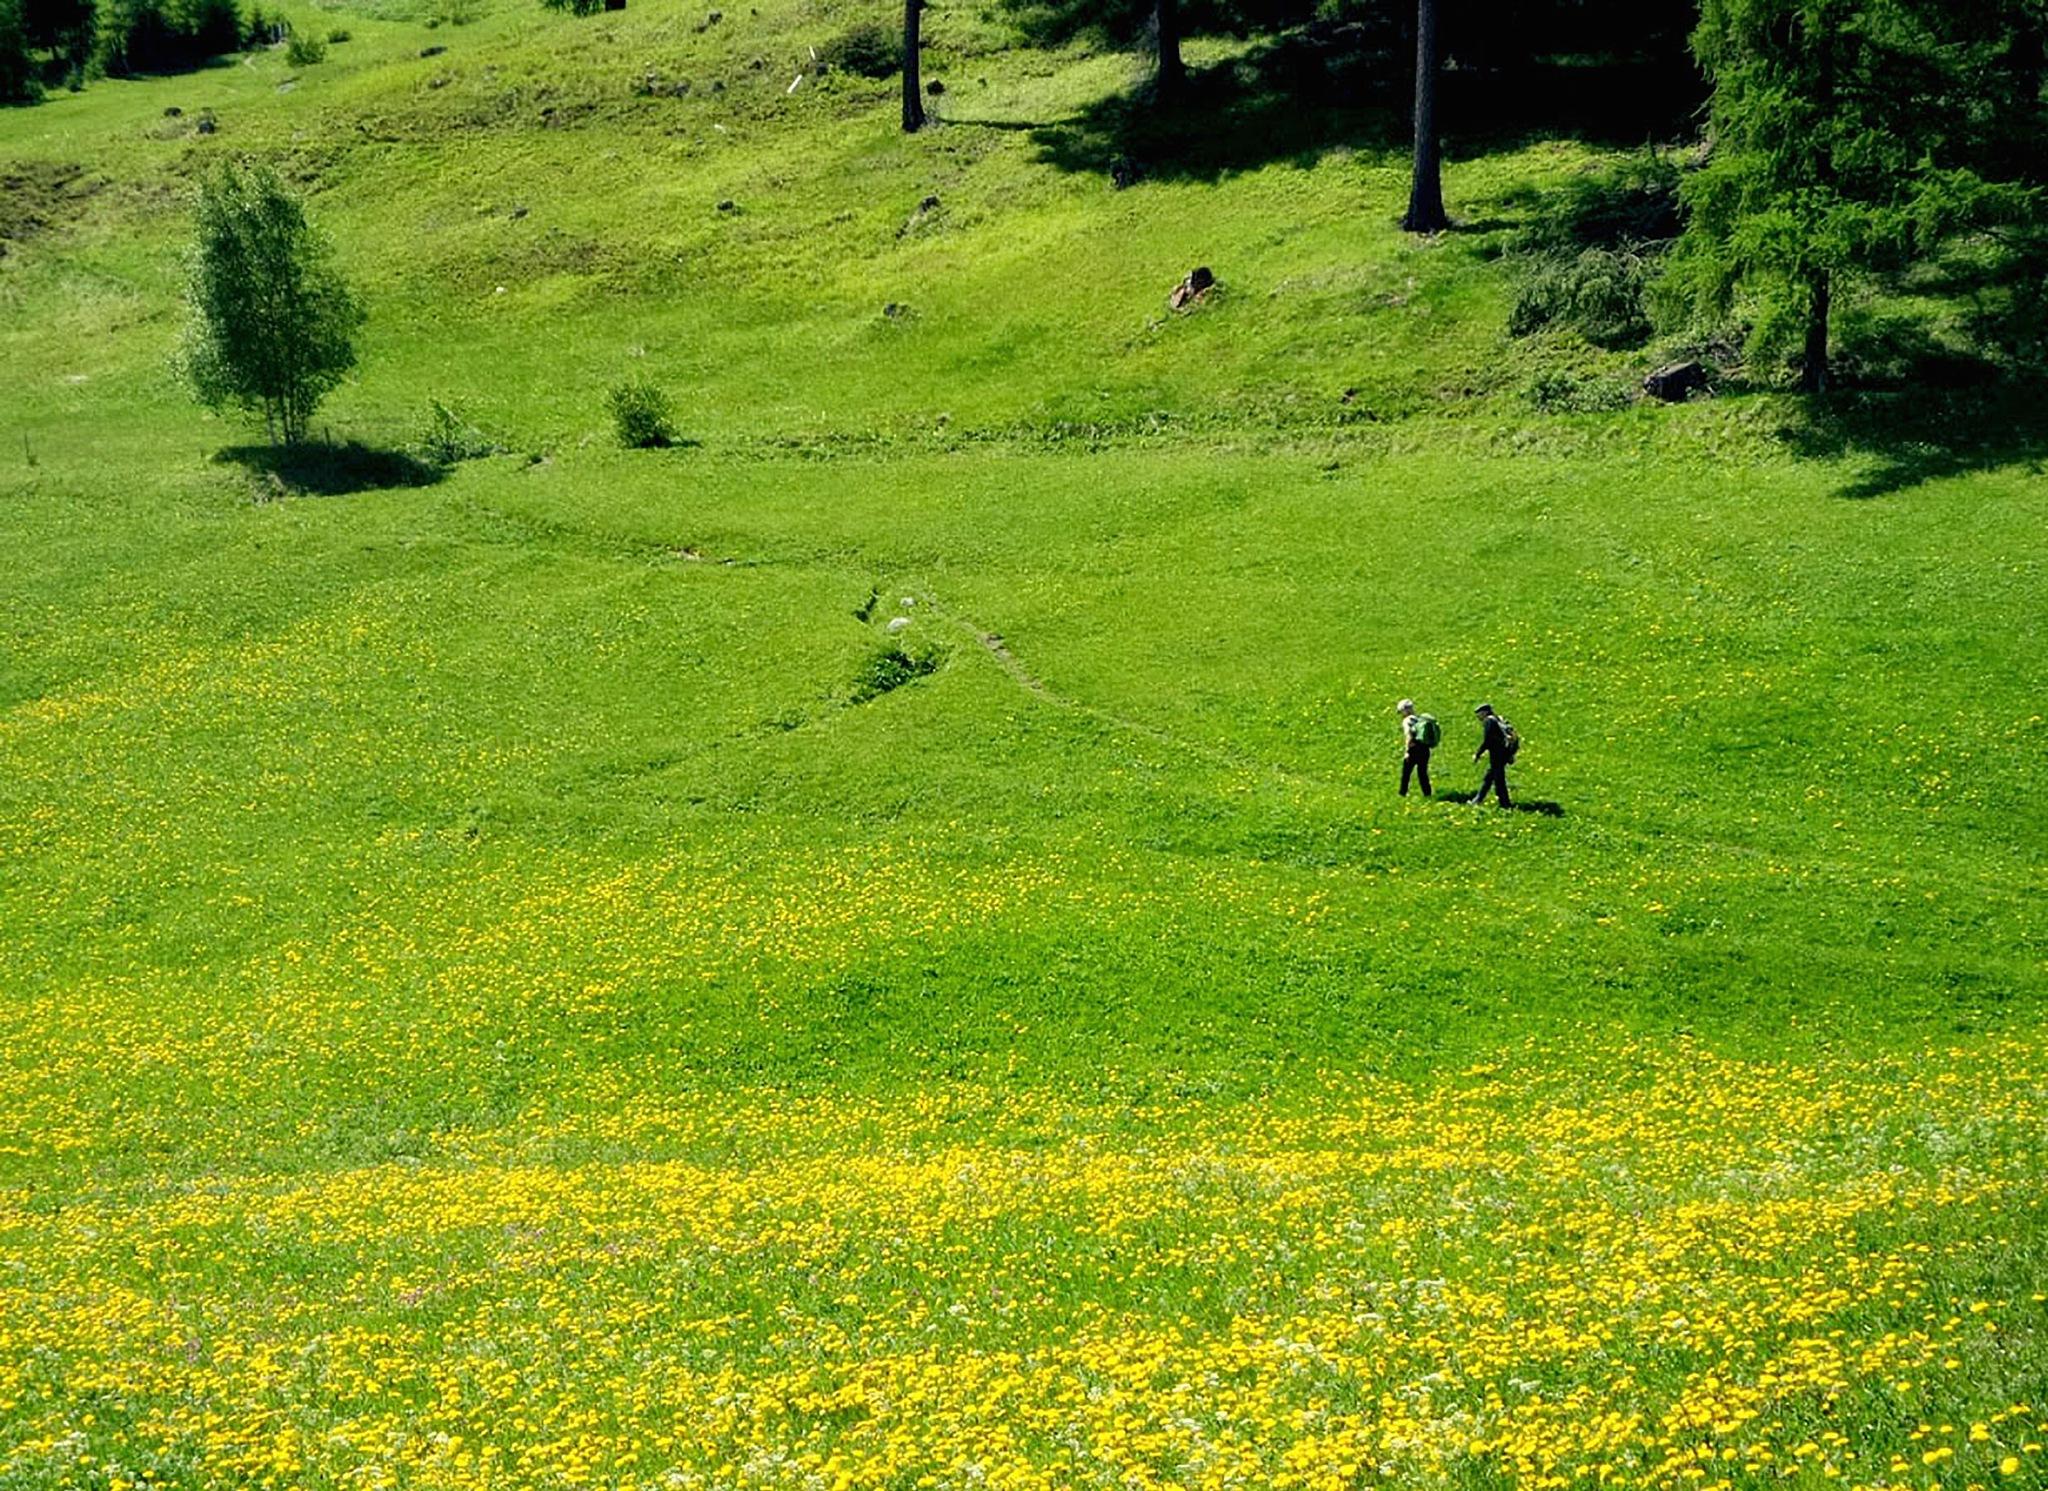 Going for a walk, Bürchen, Switzerland by Jason Yoon